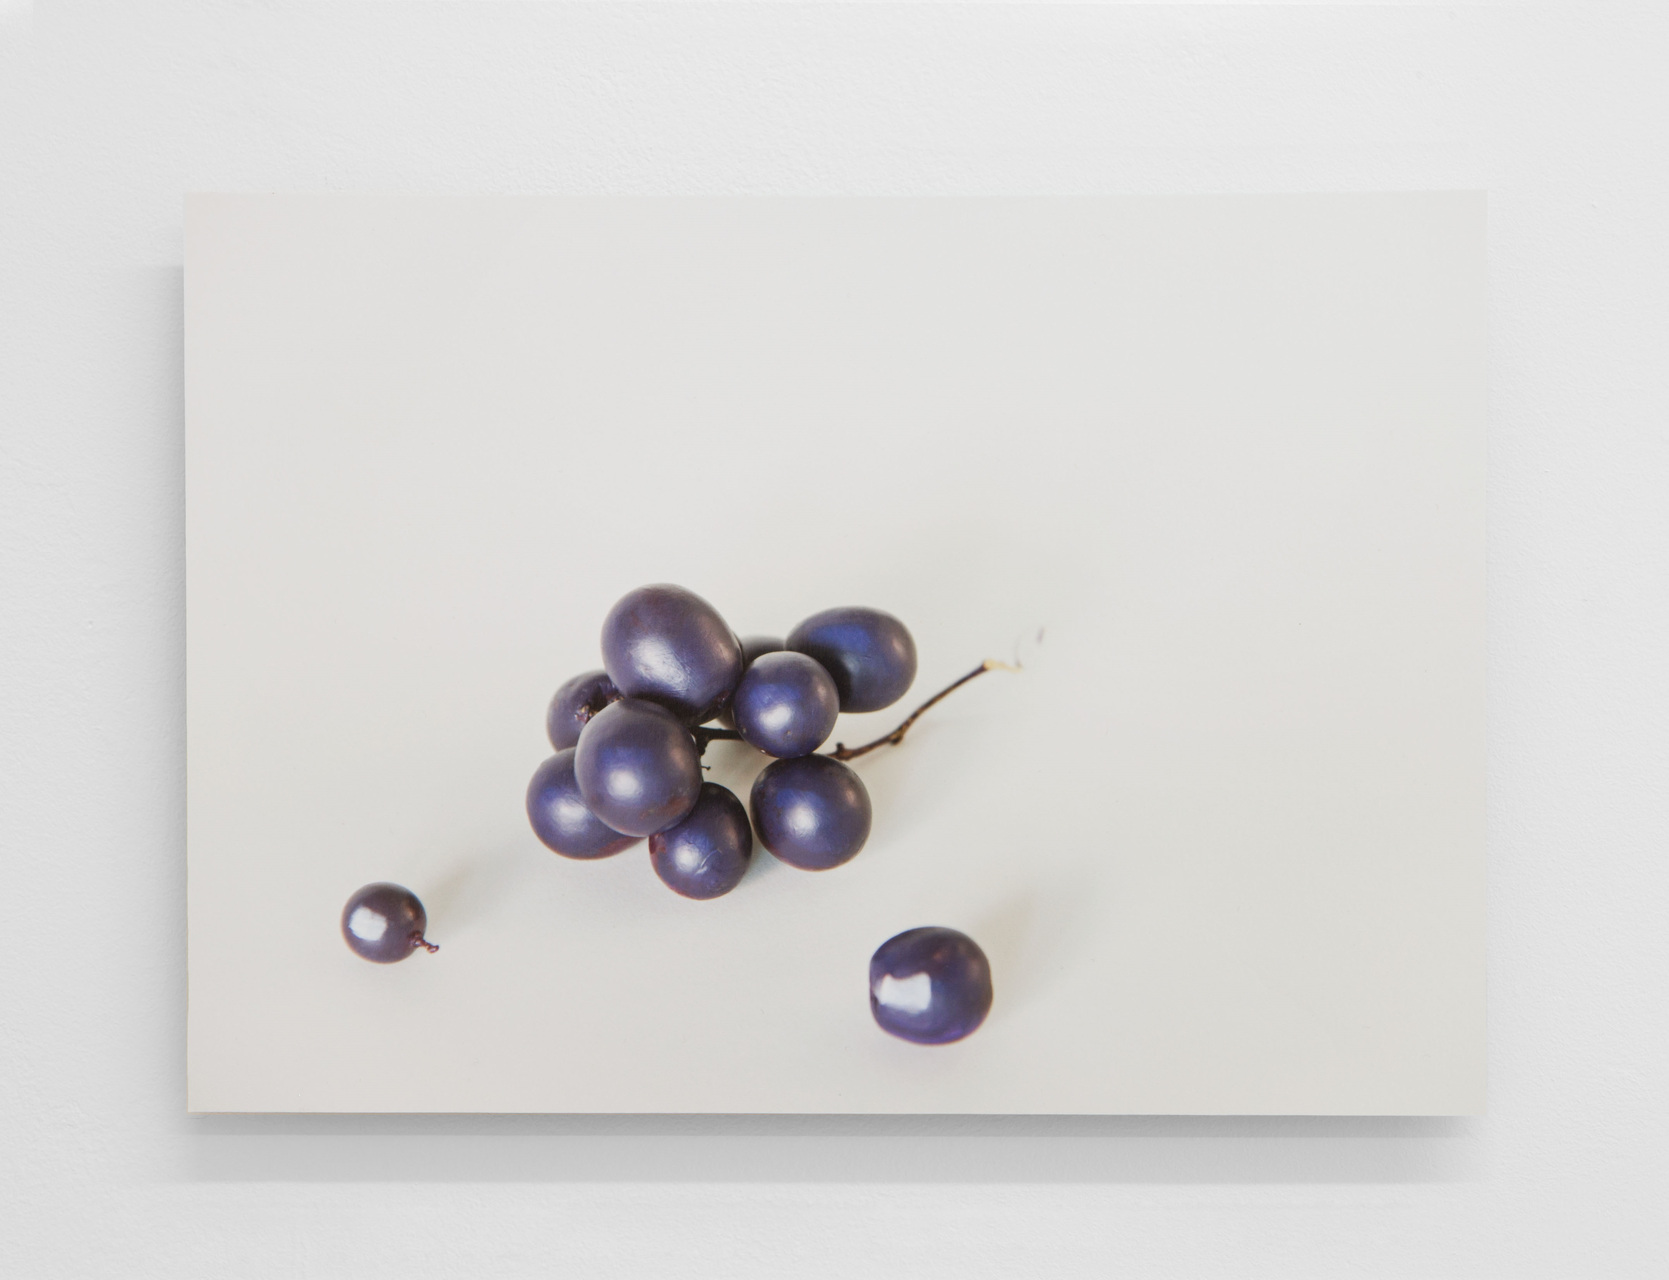 16 Grapes